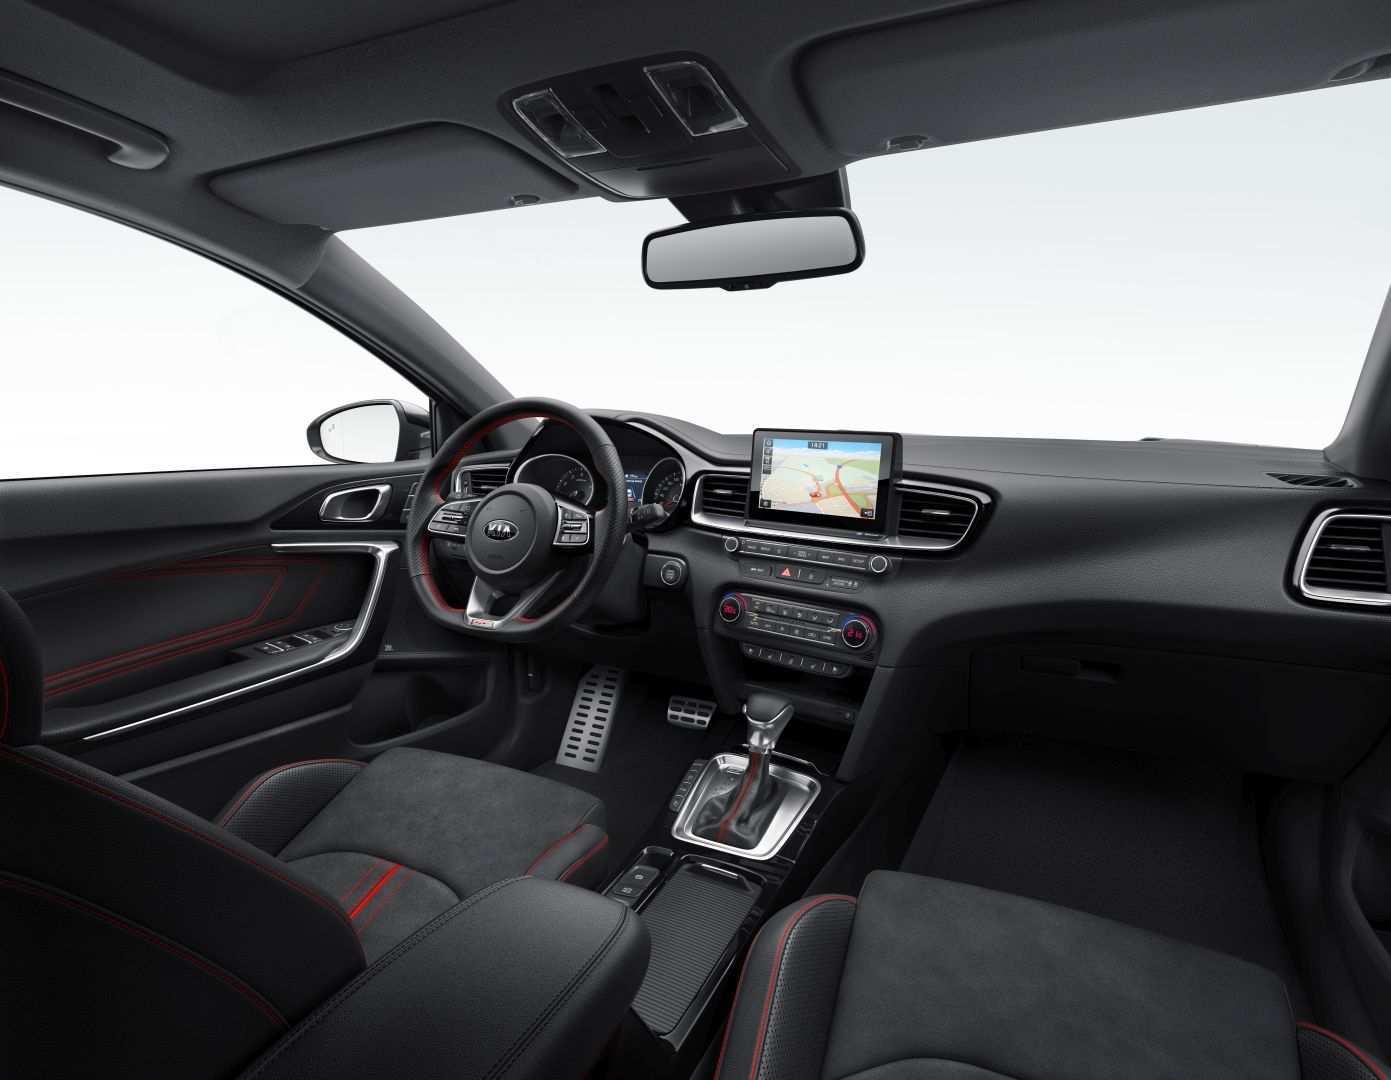 24 Concept of The Kia Ceed 2019 Interior Interior Exterior And Review Picture with The Kia Ceed 2019 Interior Interior Exterior And Review